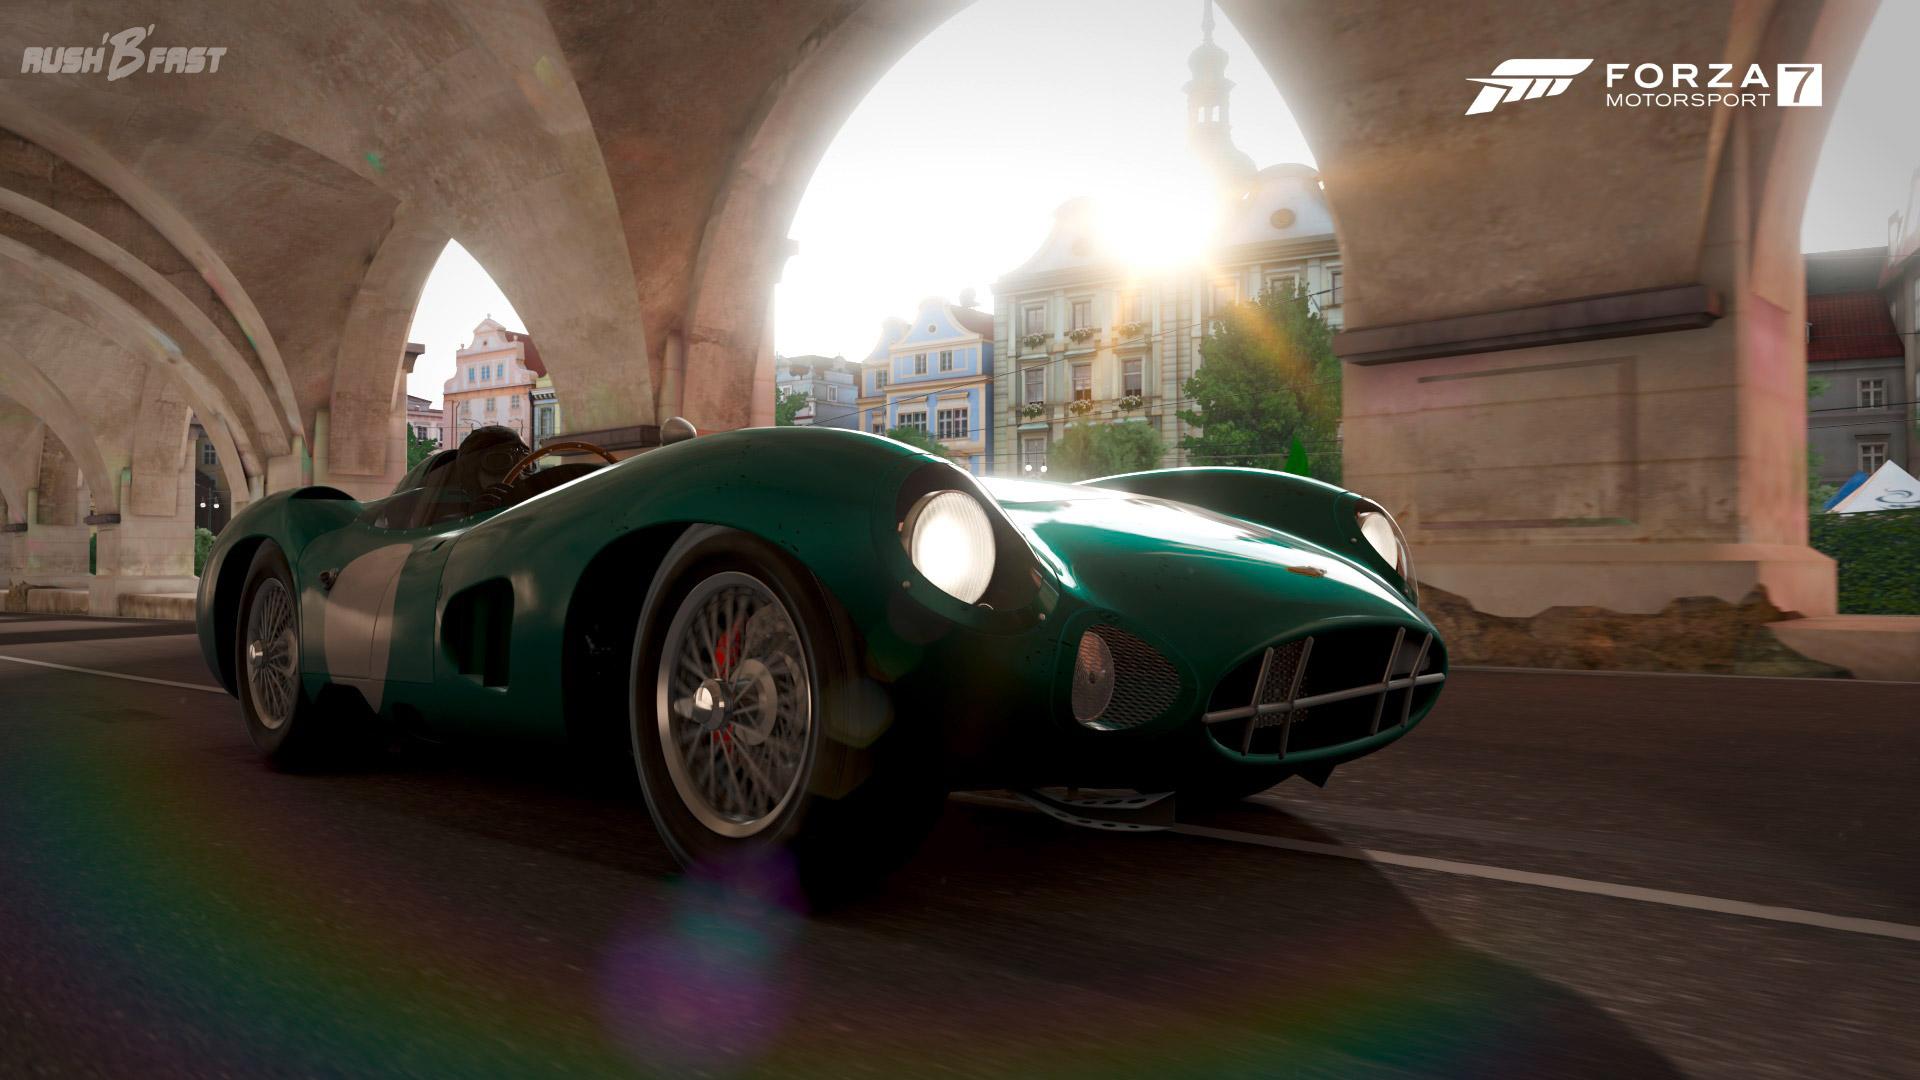 Forza Motorsport 7 - 1958 Aston Martin DBR1